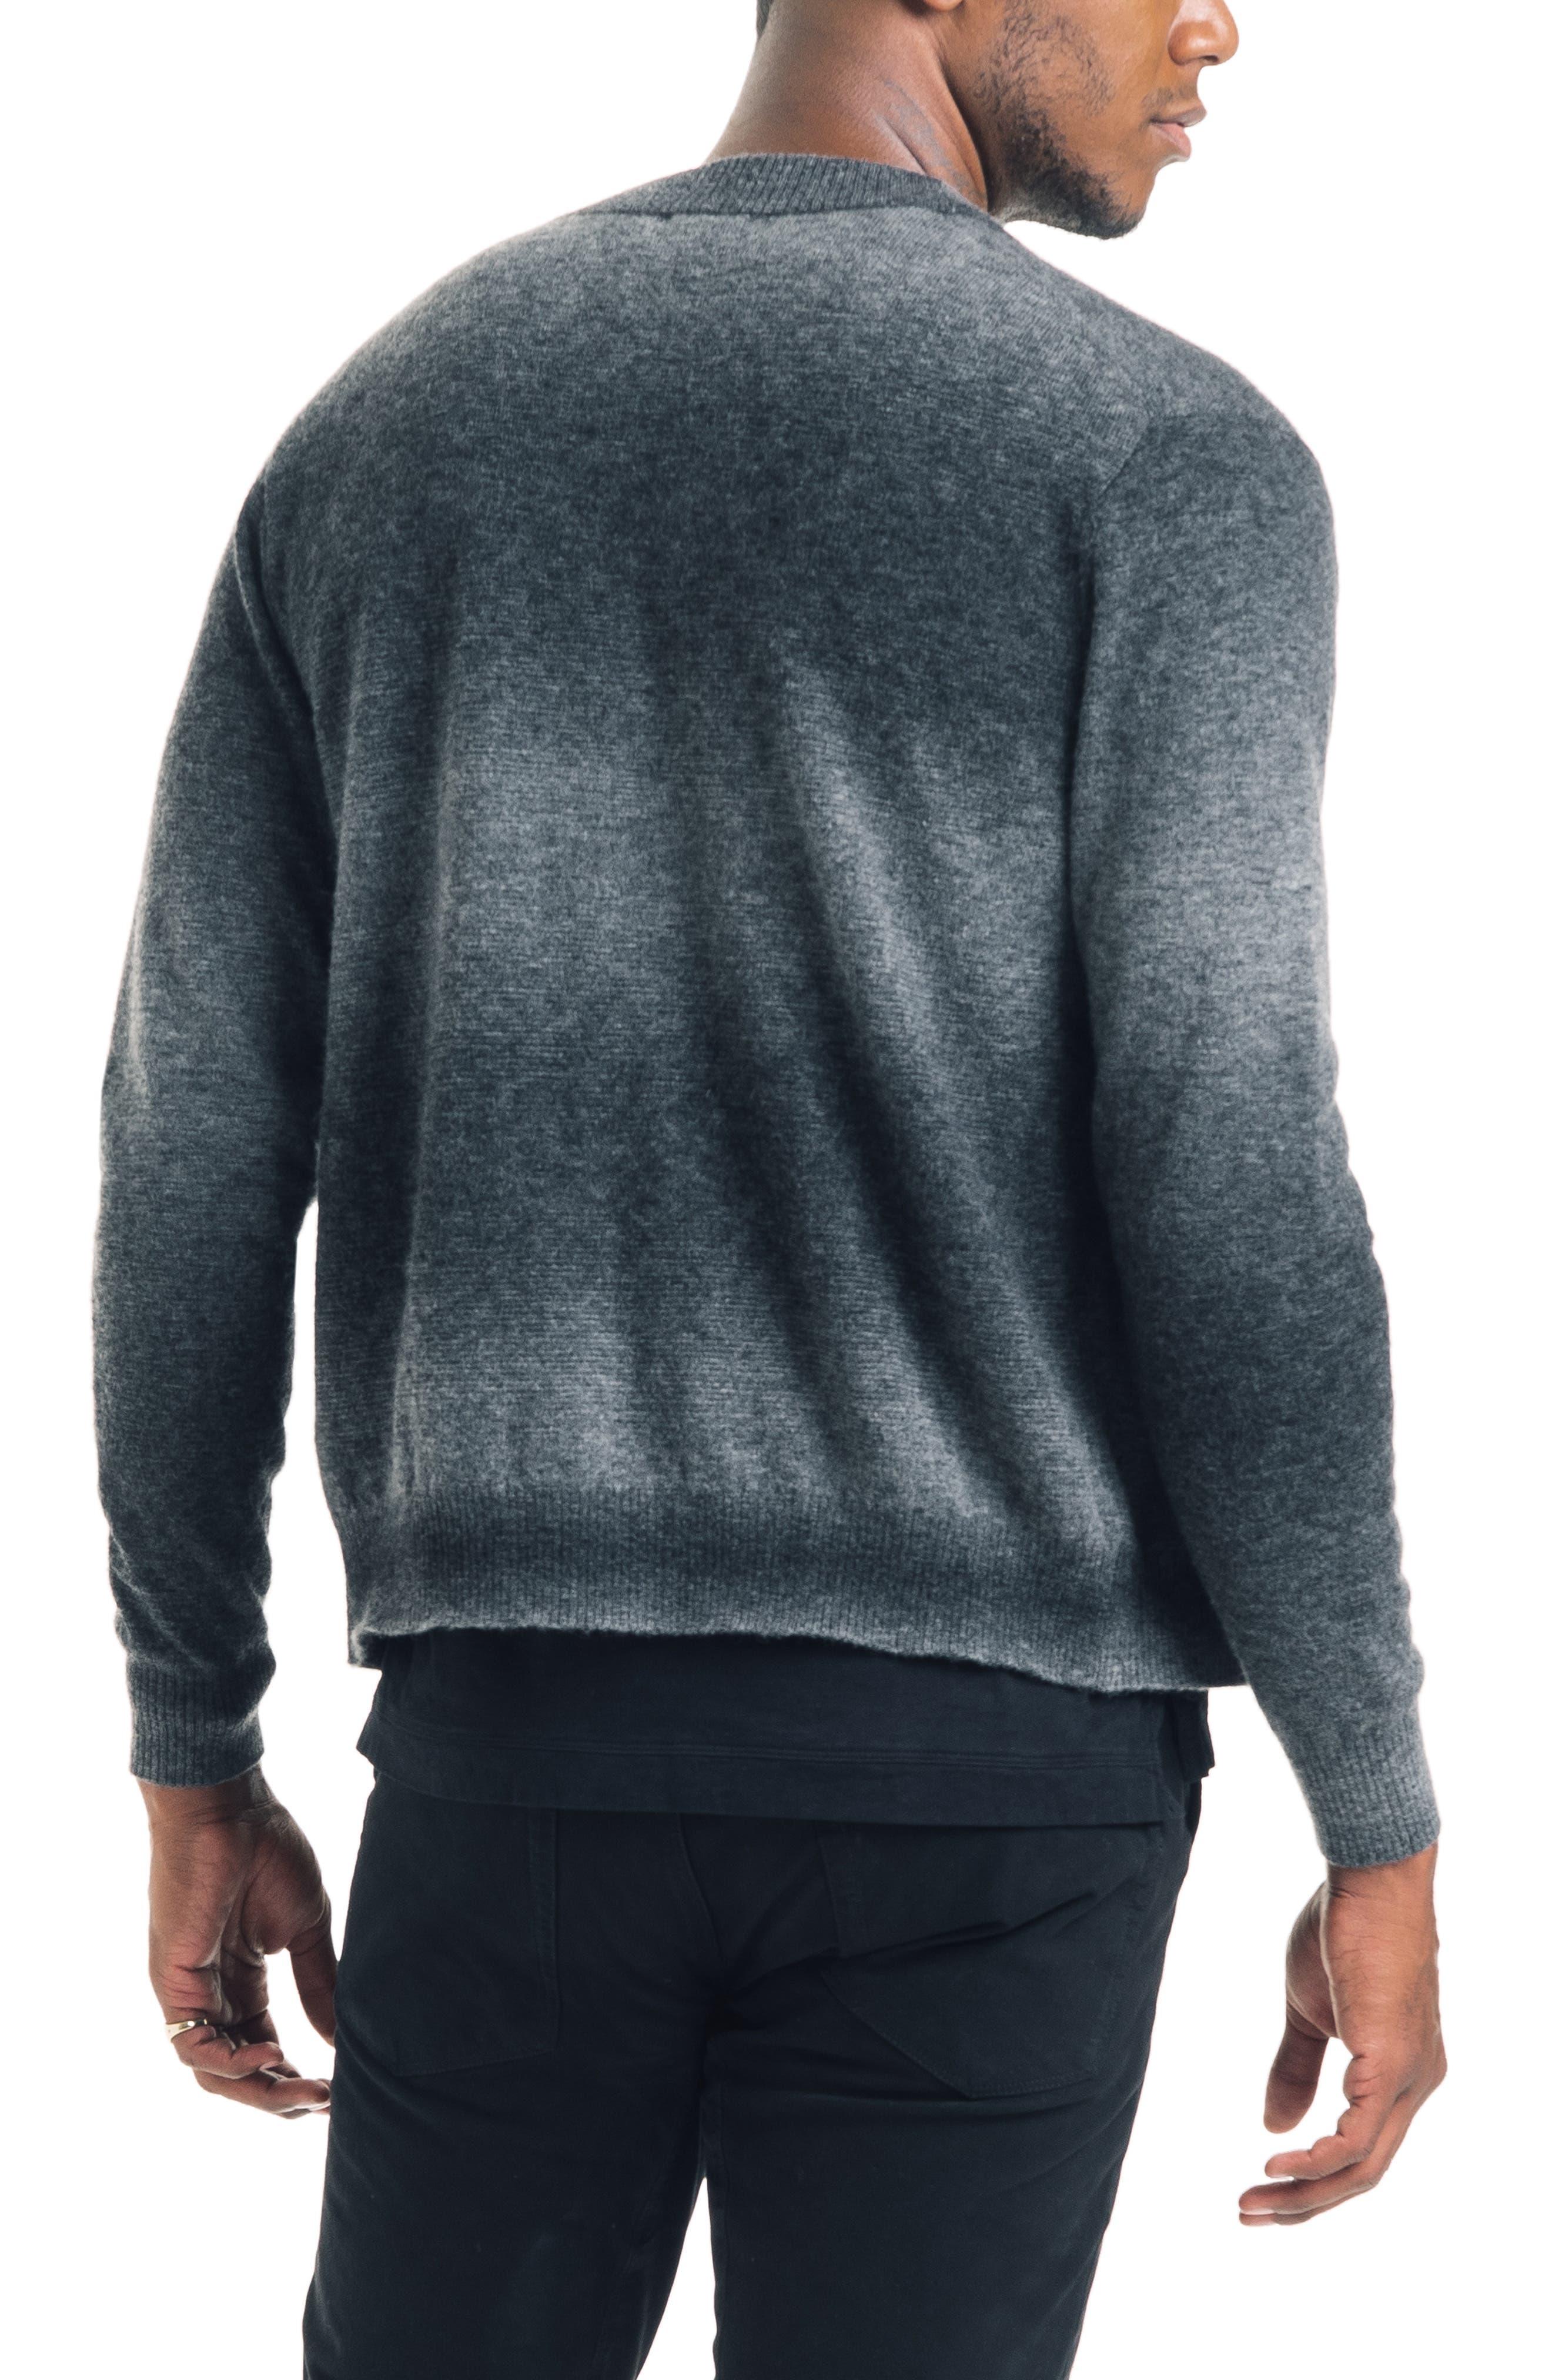 Modern Slim Fit Merino Wool Blend Cardigan,                             Alternate thumbnail 2, color,                             BLACK / GREY